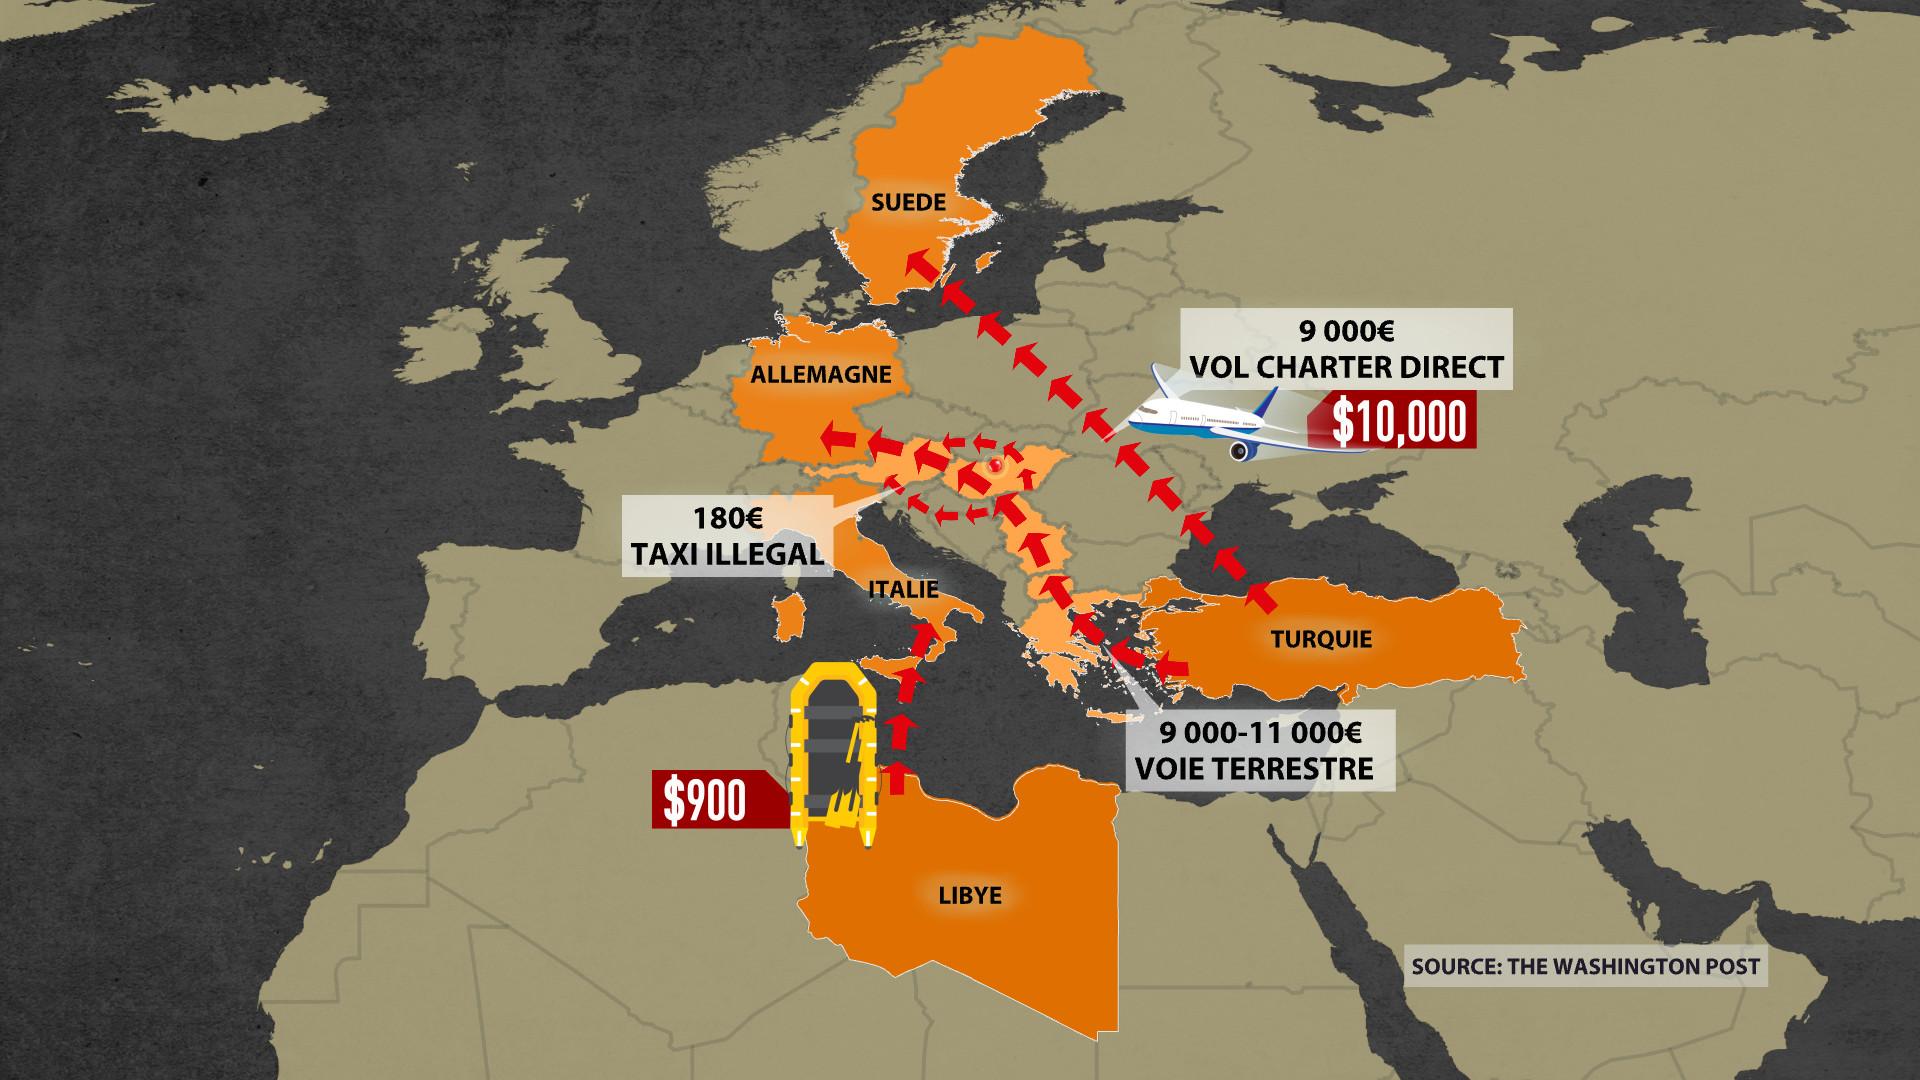 Les moyens d'atteindre l'Europe